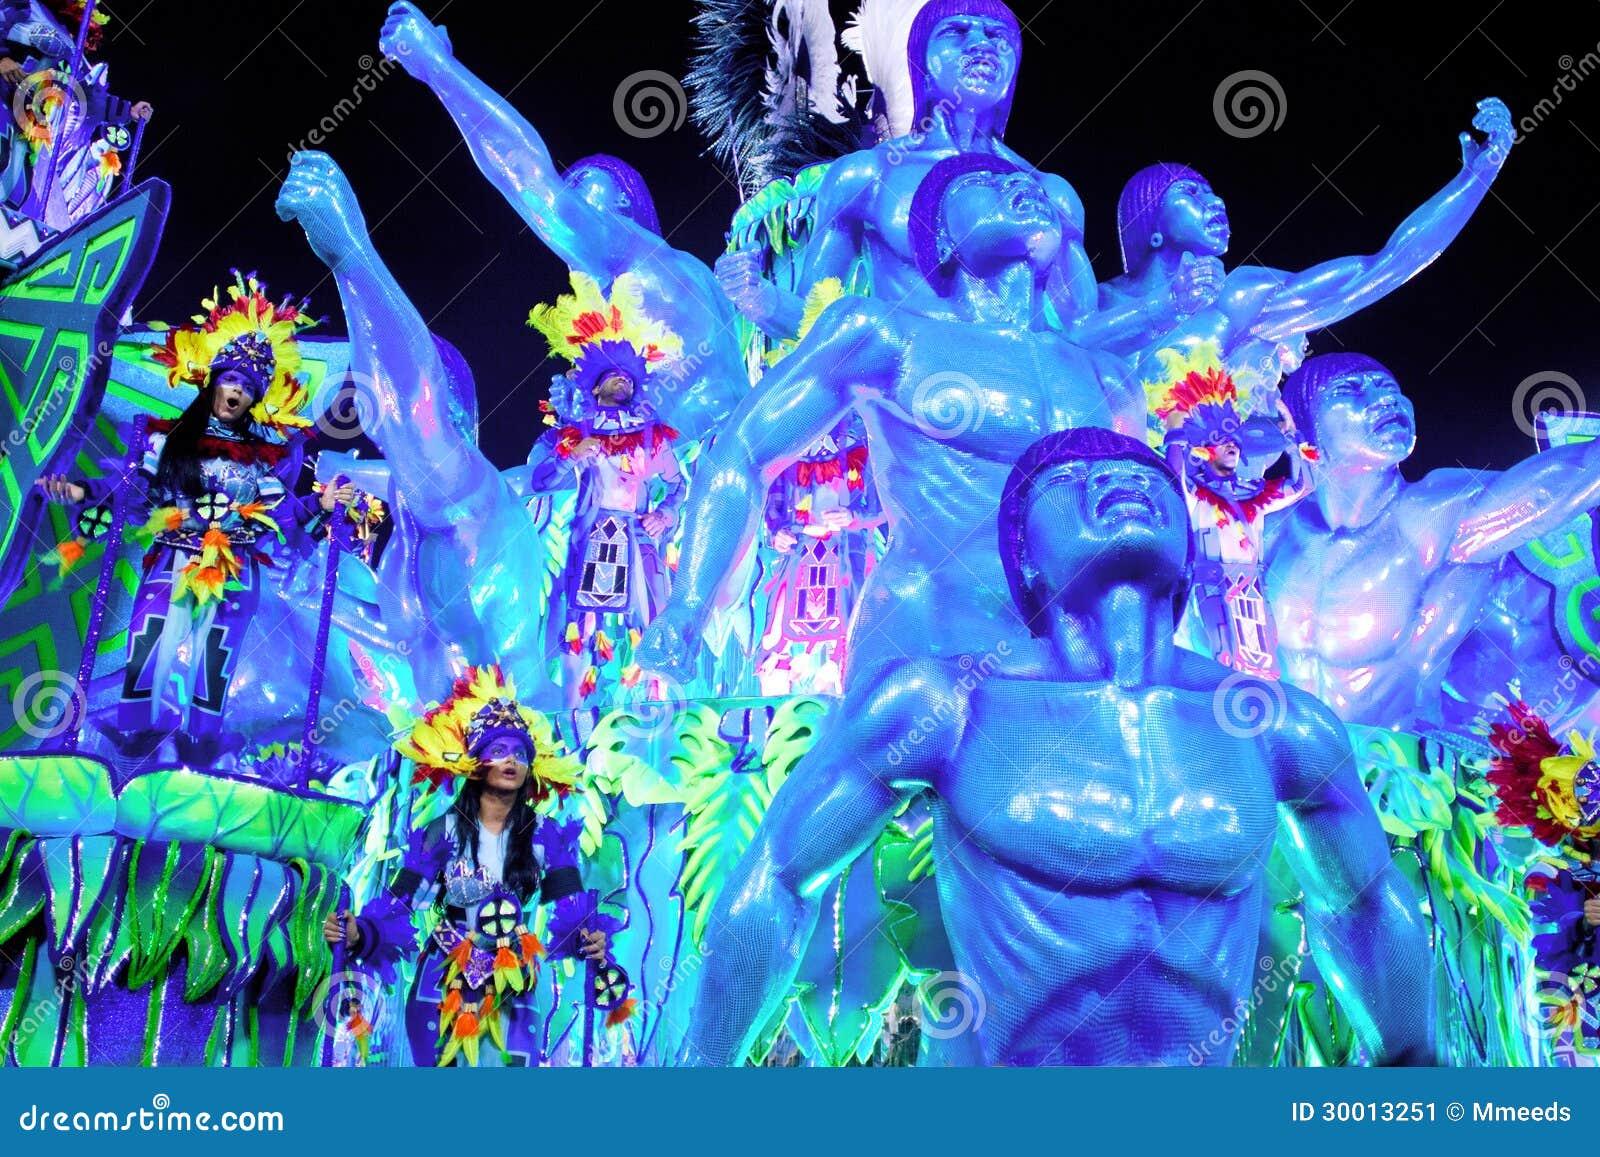 Brazilian carnival costume ideas